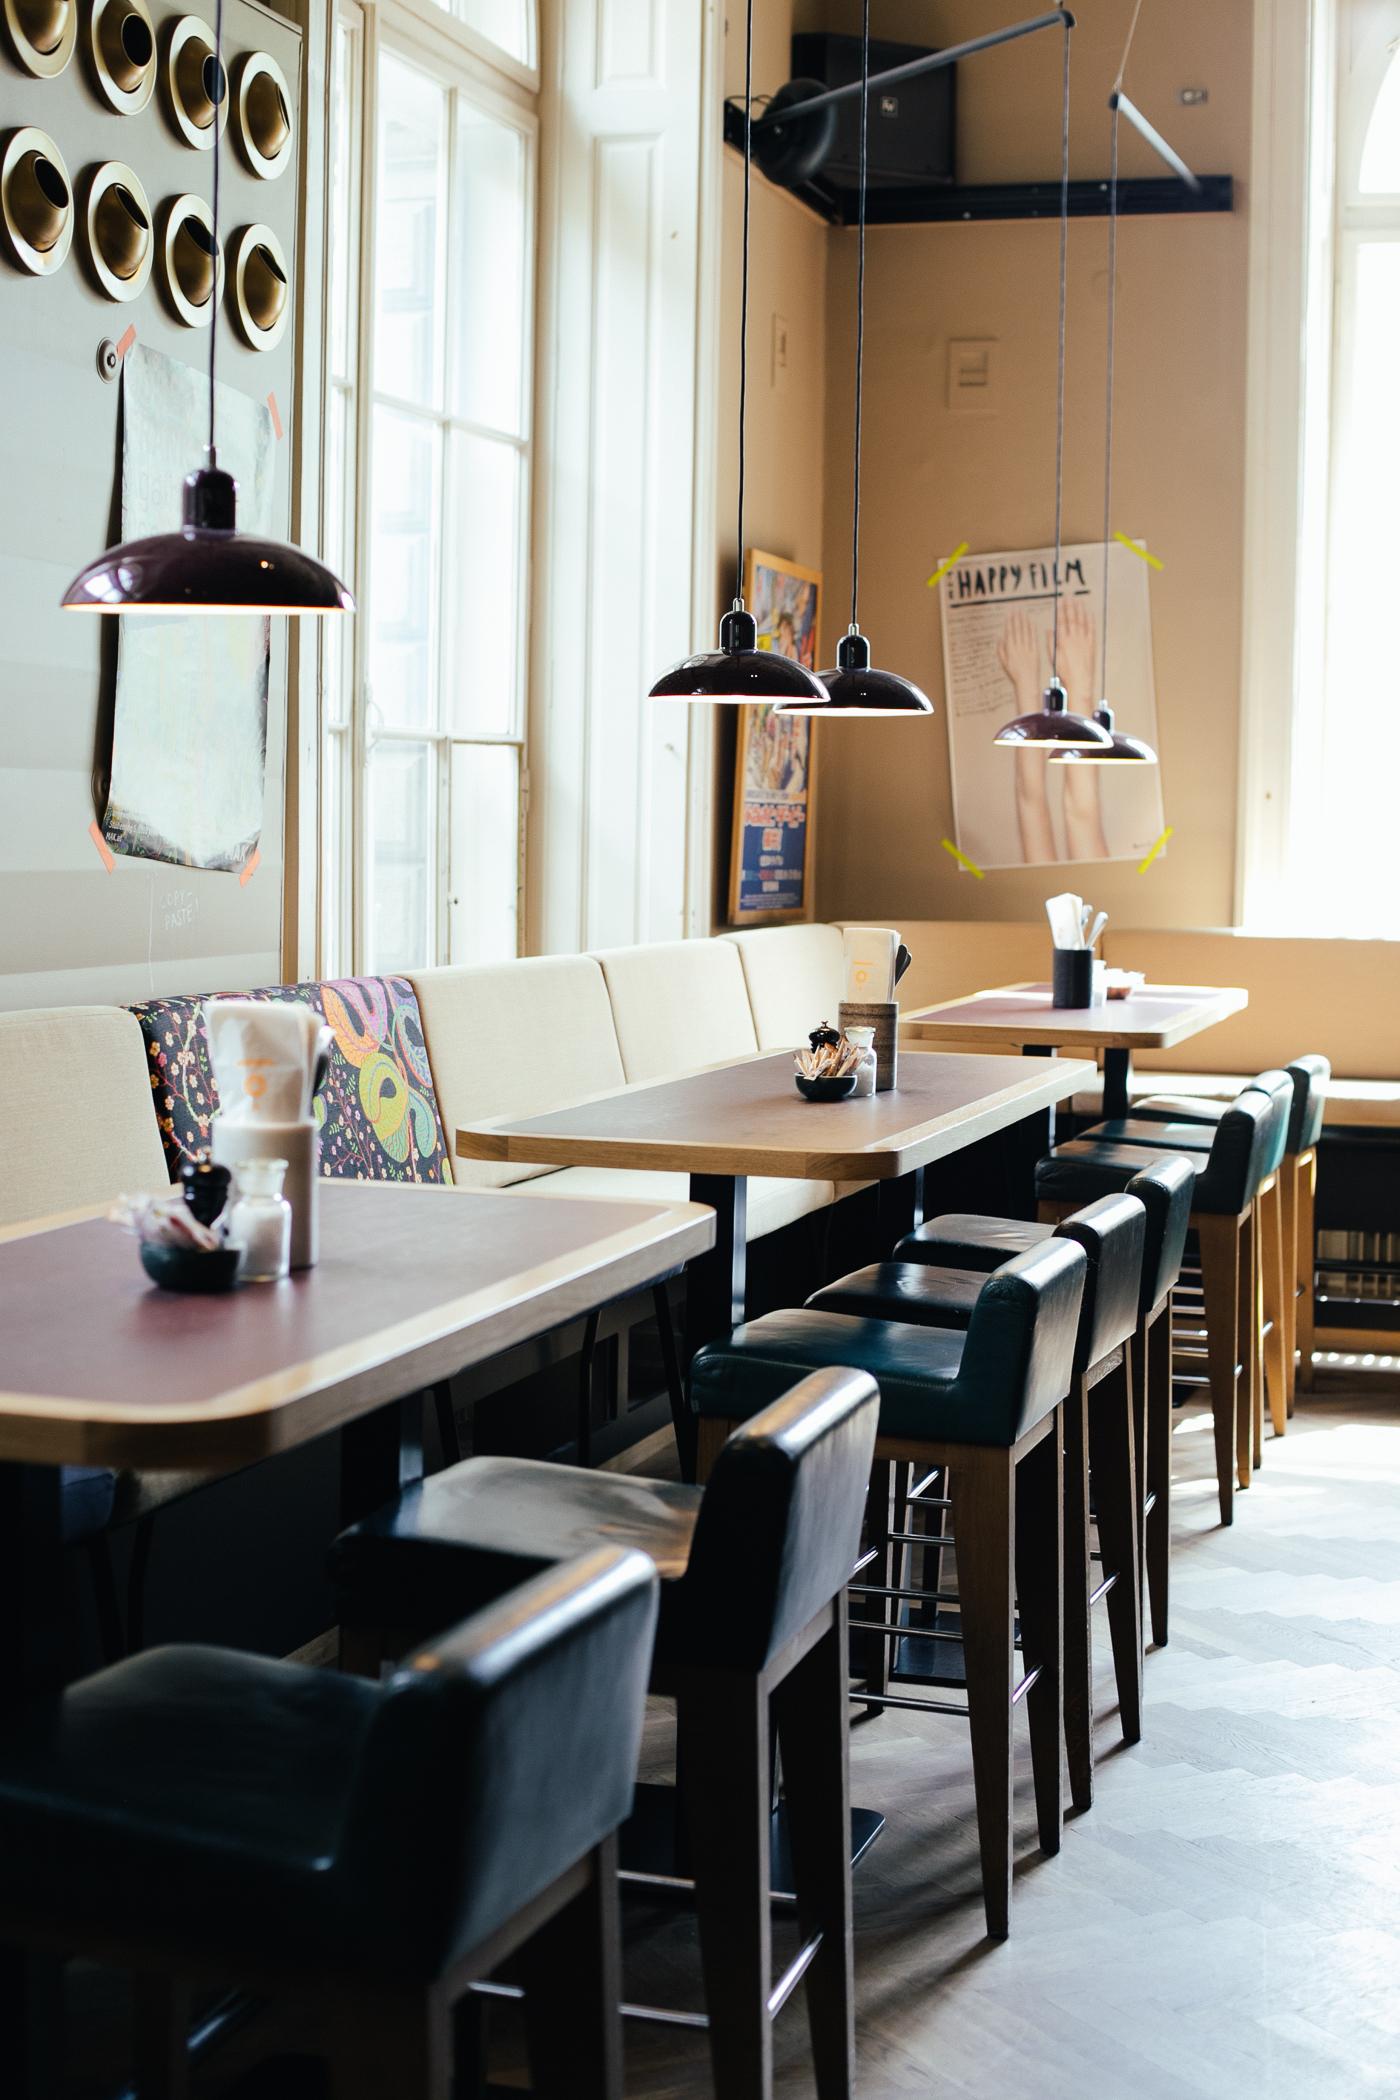 Vienna Picks: Salonplafond im MAK Frühstück | Love Daily Dose